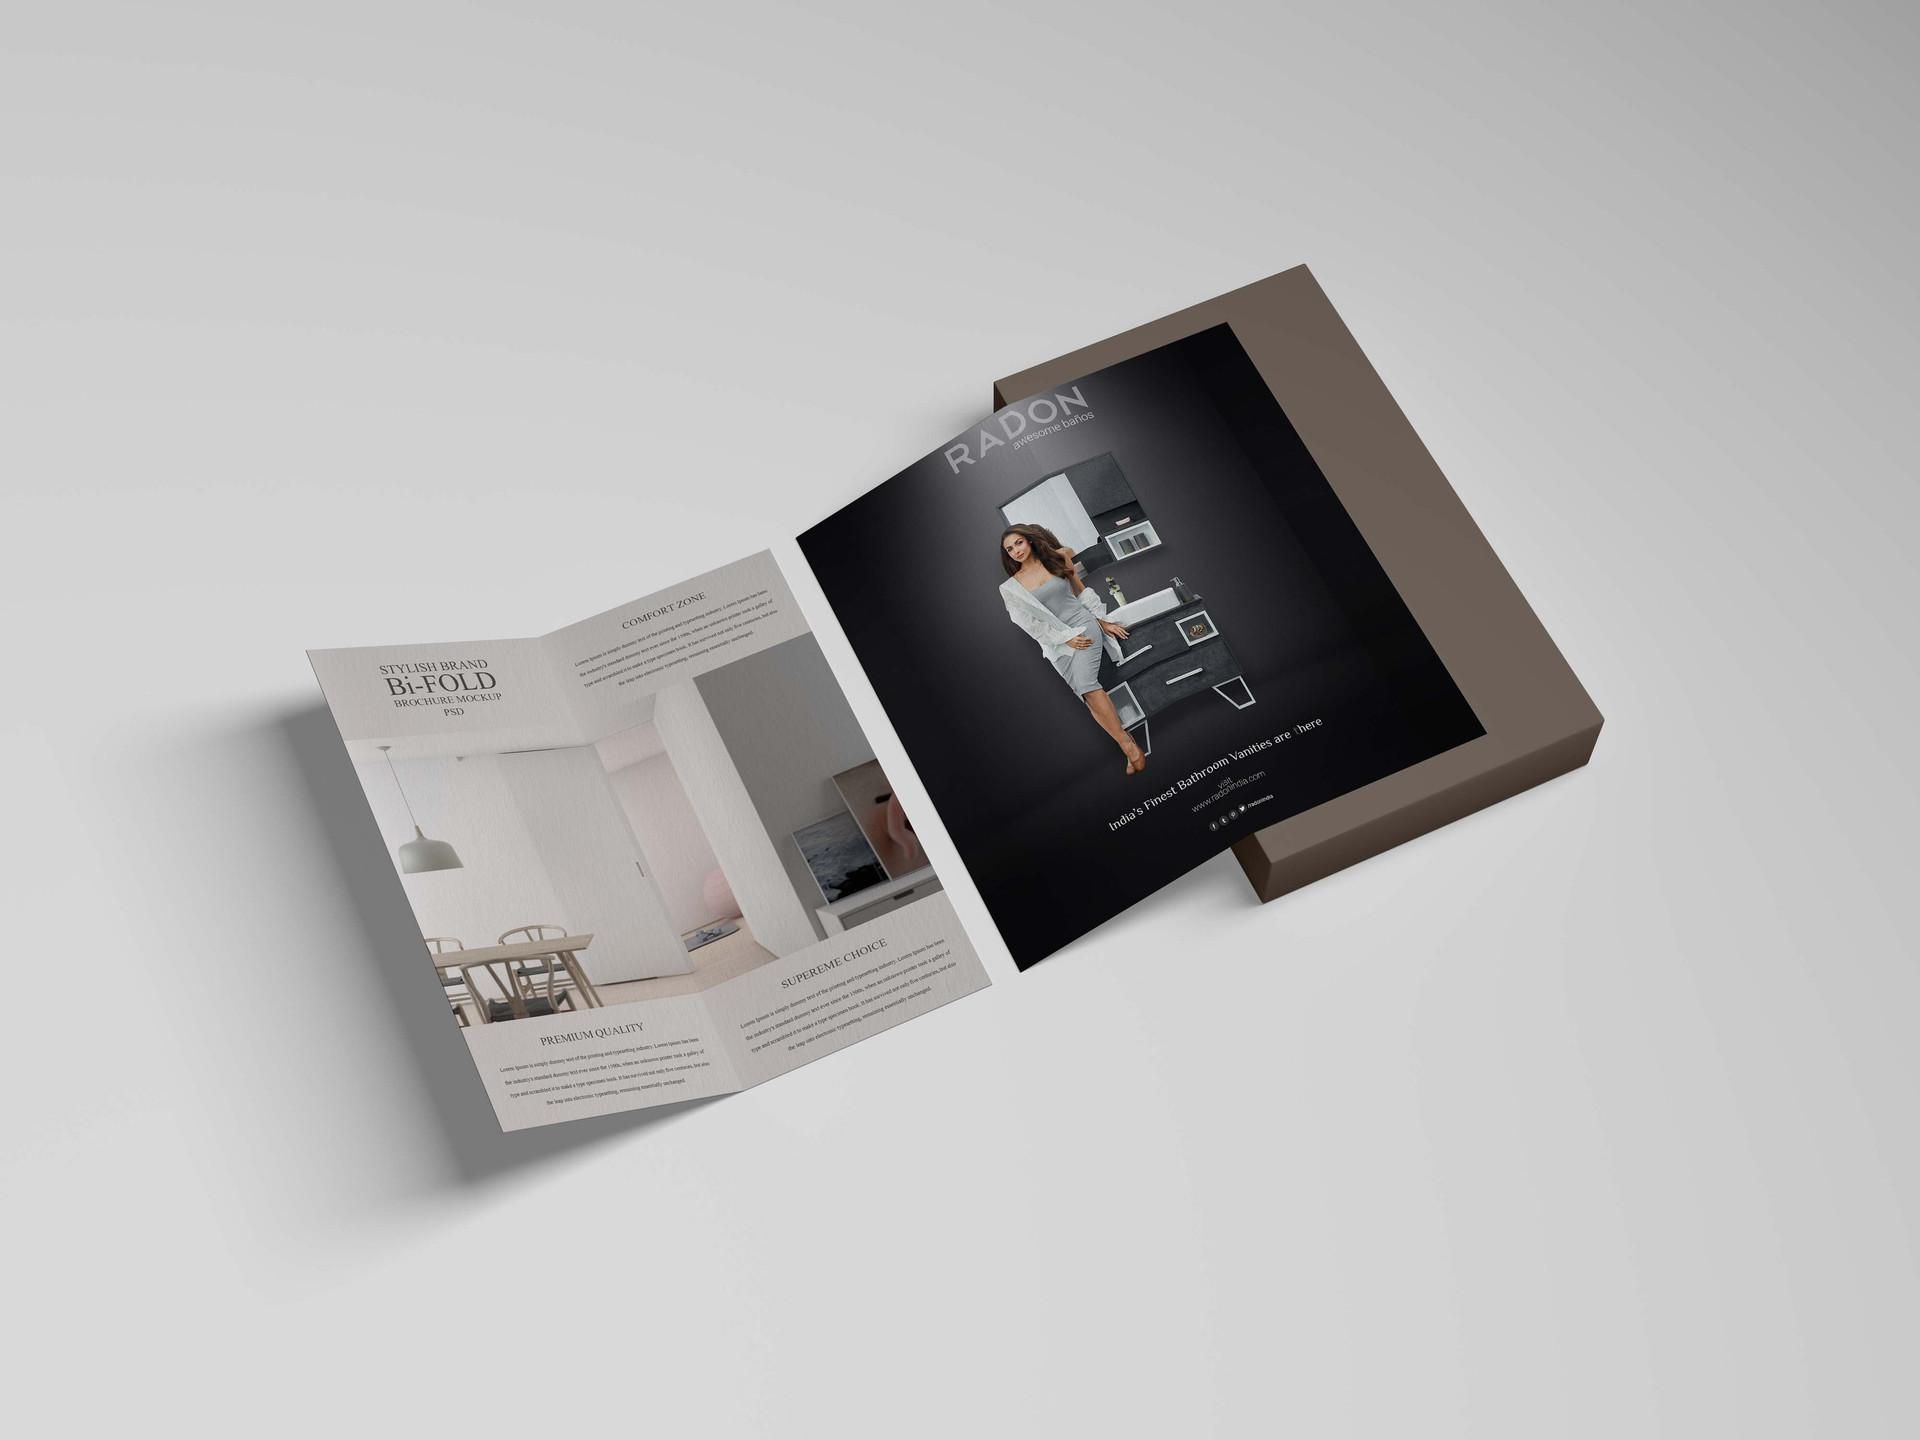 wortham digital designs.jpg